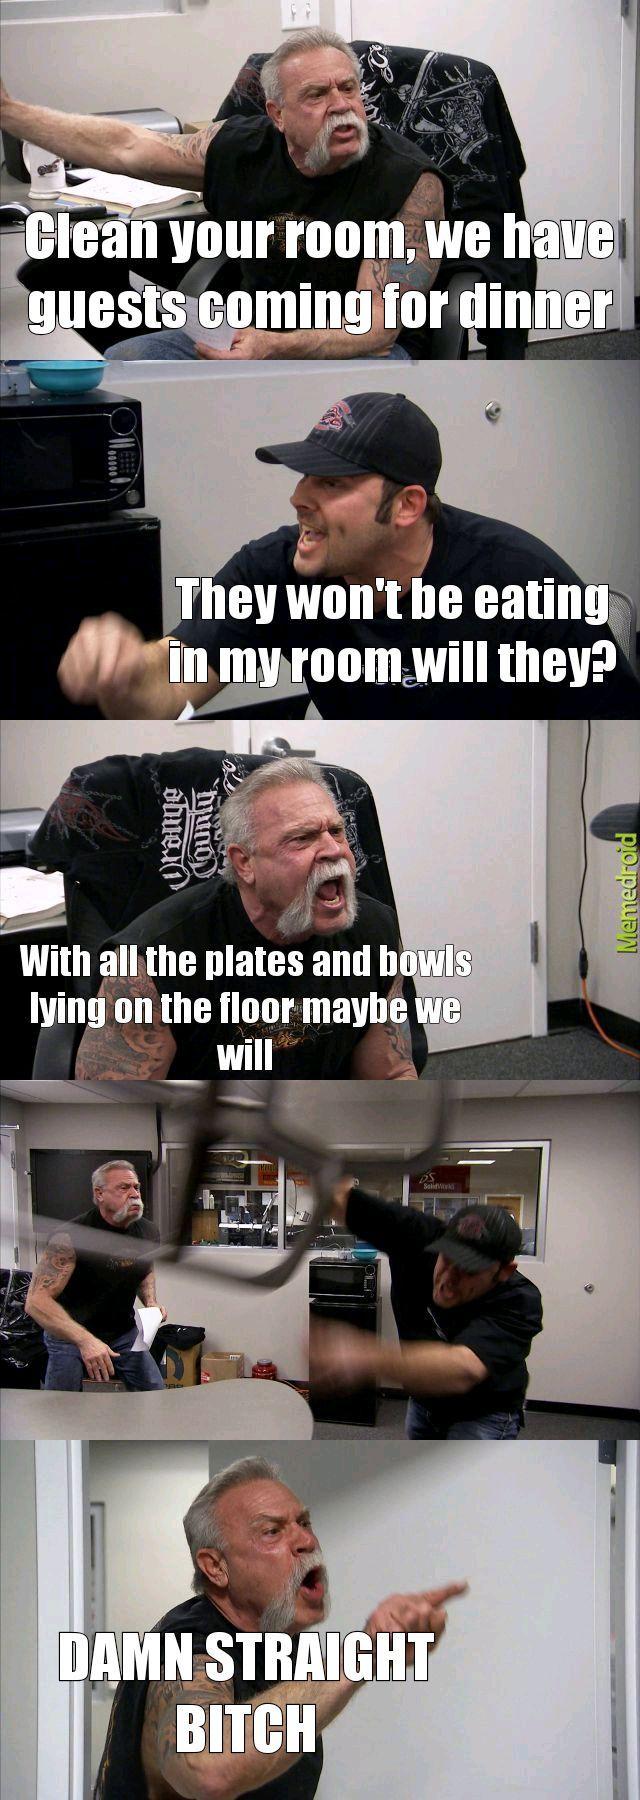 Do kinda be like that - meme